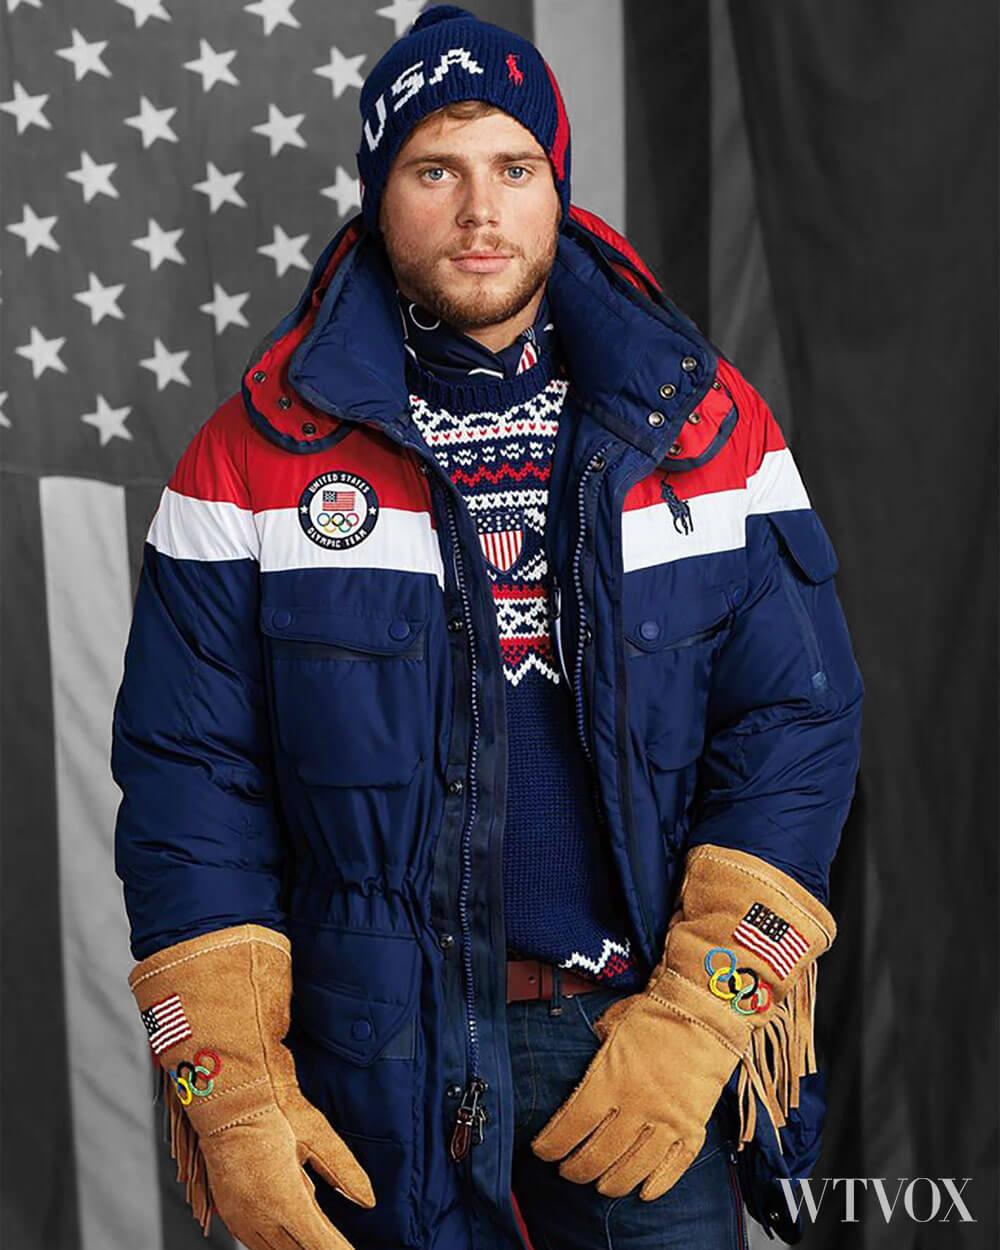 The 2018 winter Olympics Us team wearing Polo Ralph high tech heated jacket